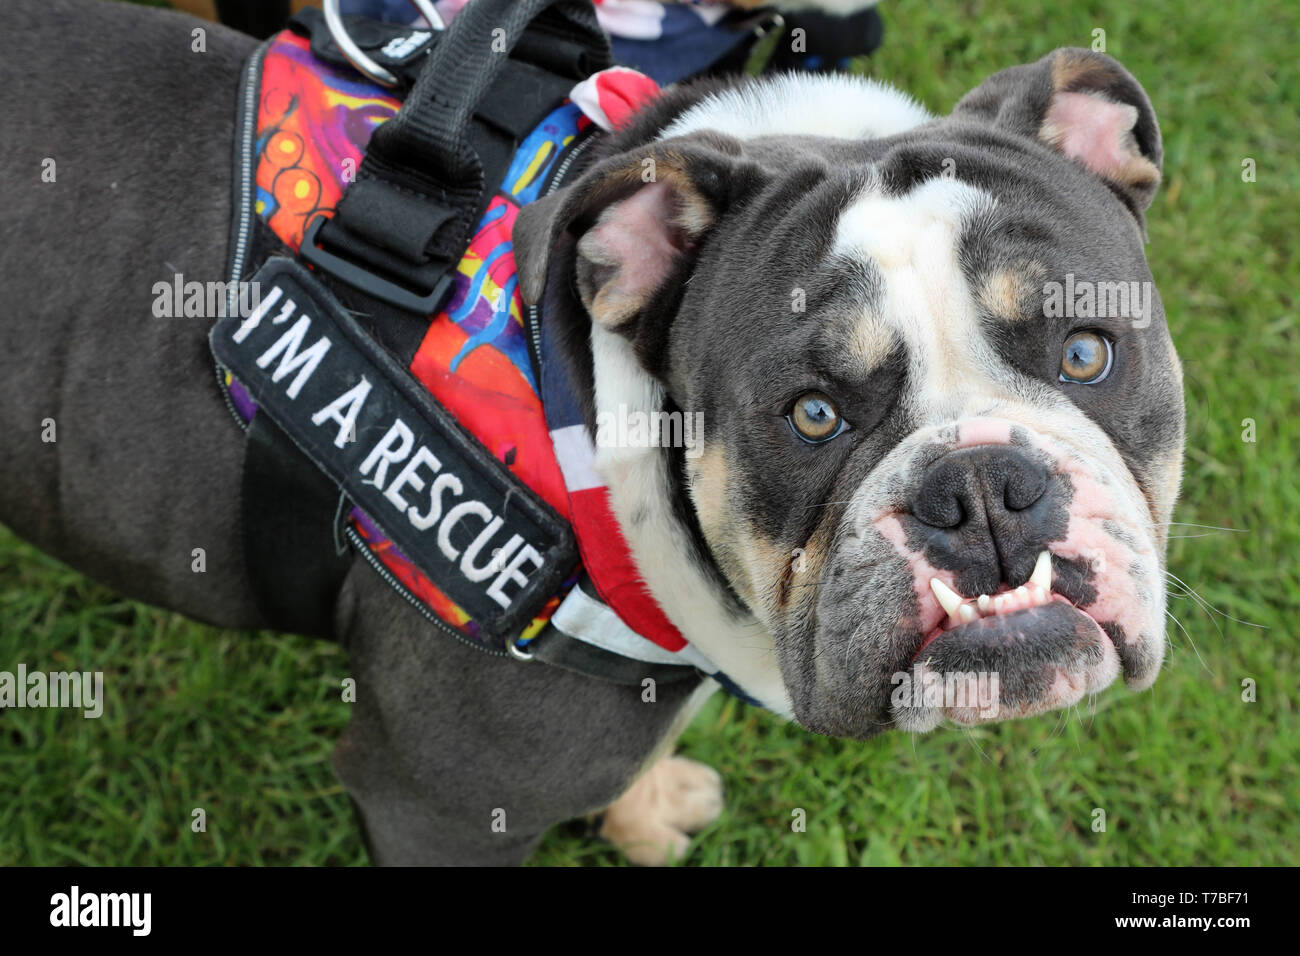 London, UK  5th May 2019  Herbert the English Bulldog in the